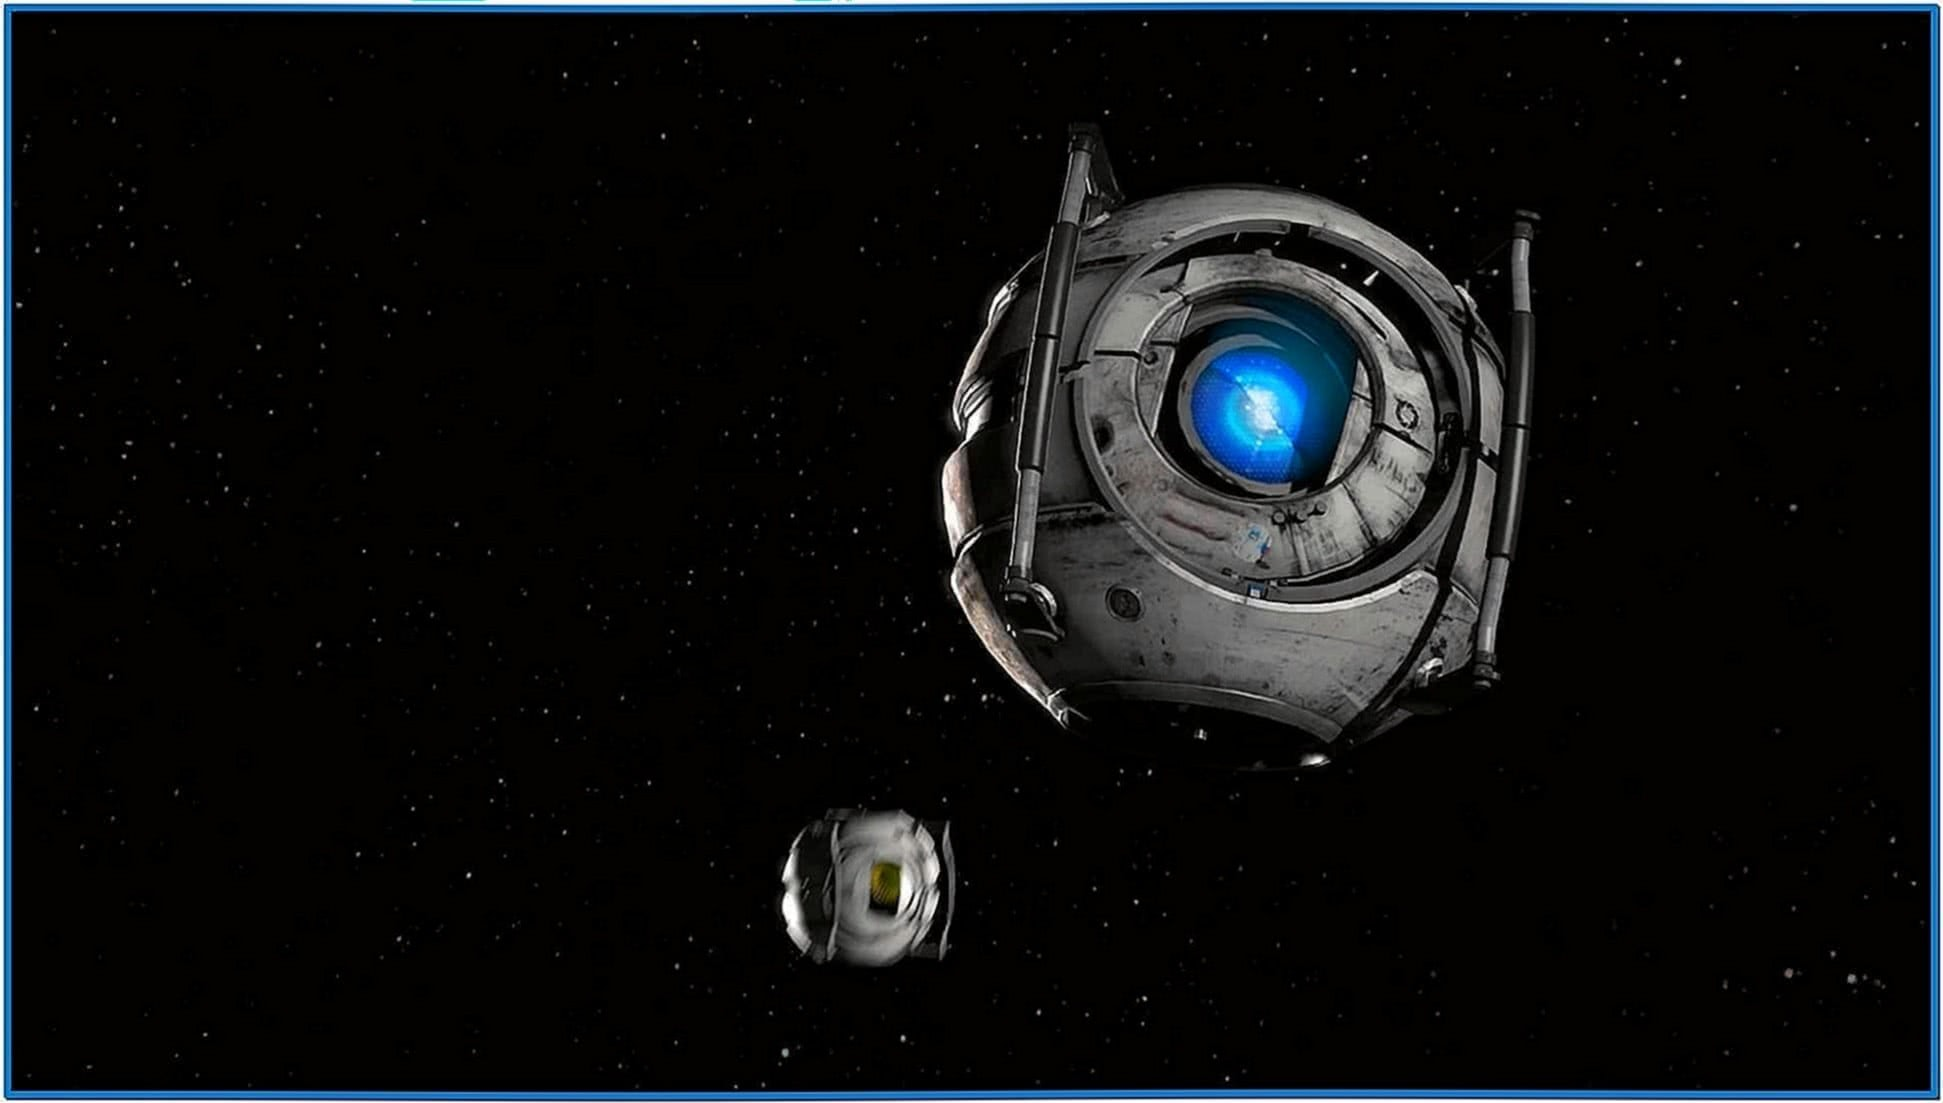 Wheatley in Space Screensaver Mac